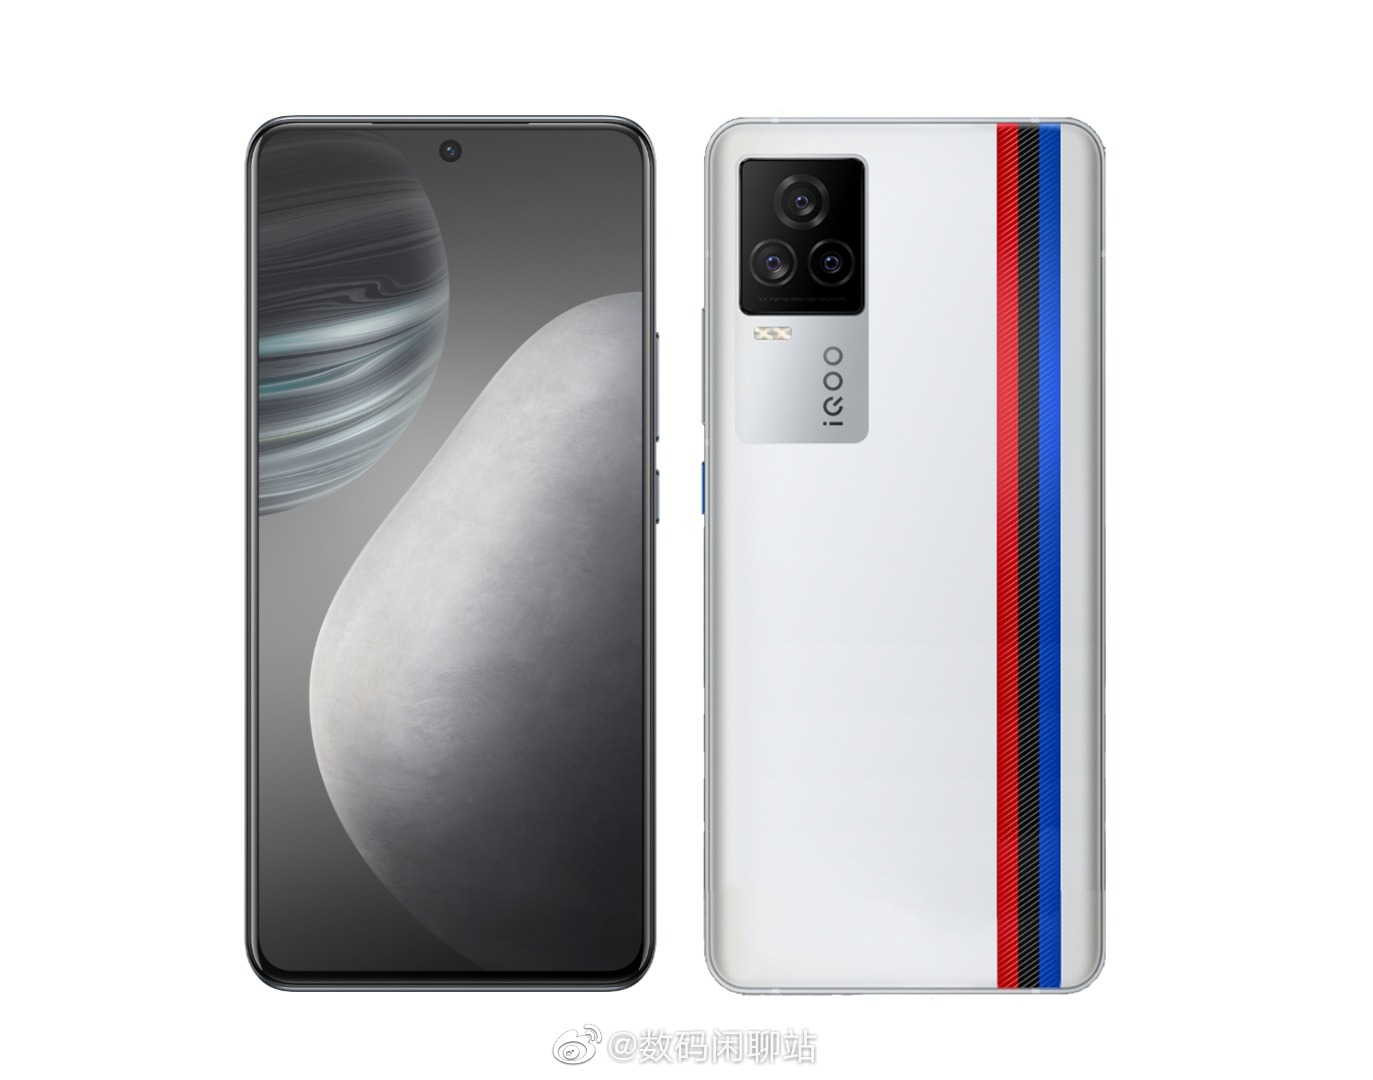 iQOO 7 Design